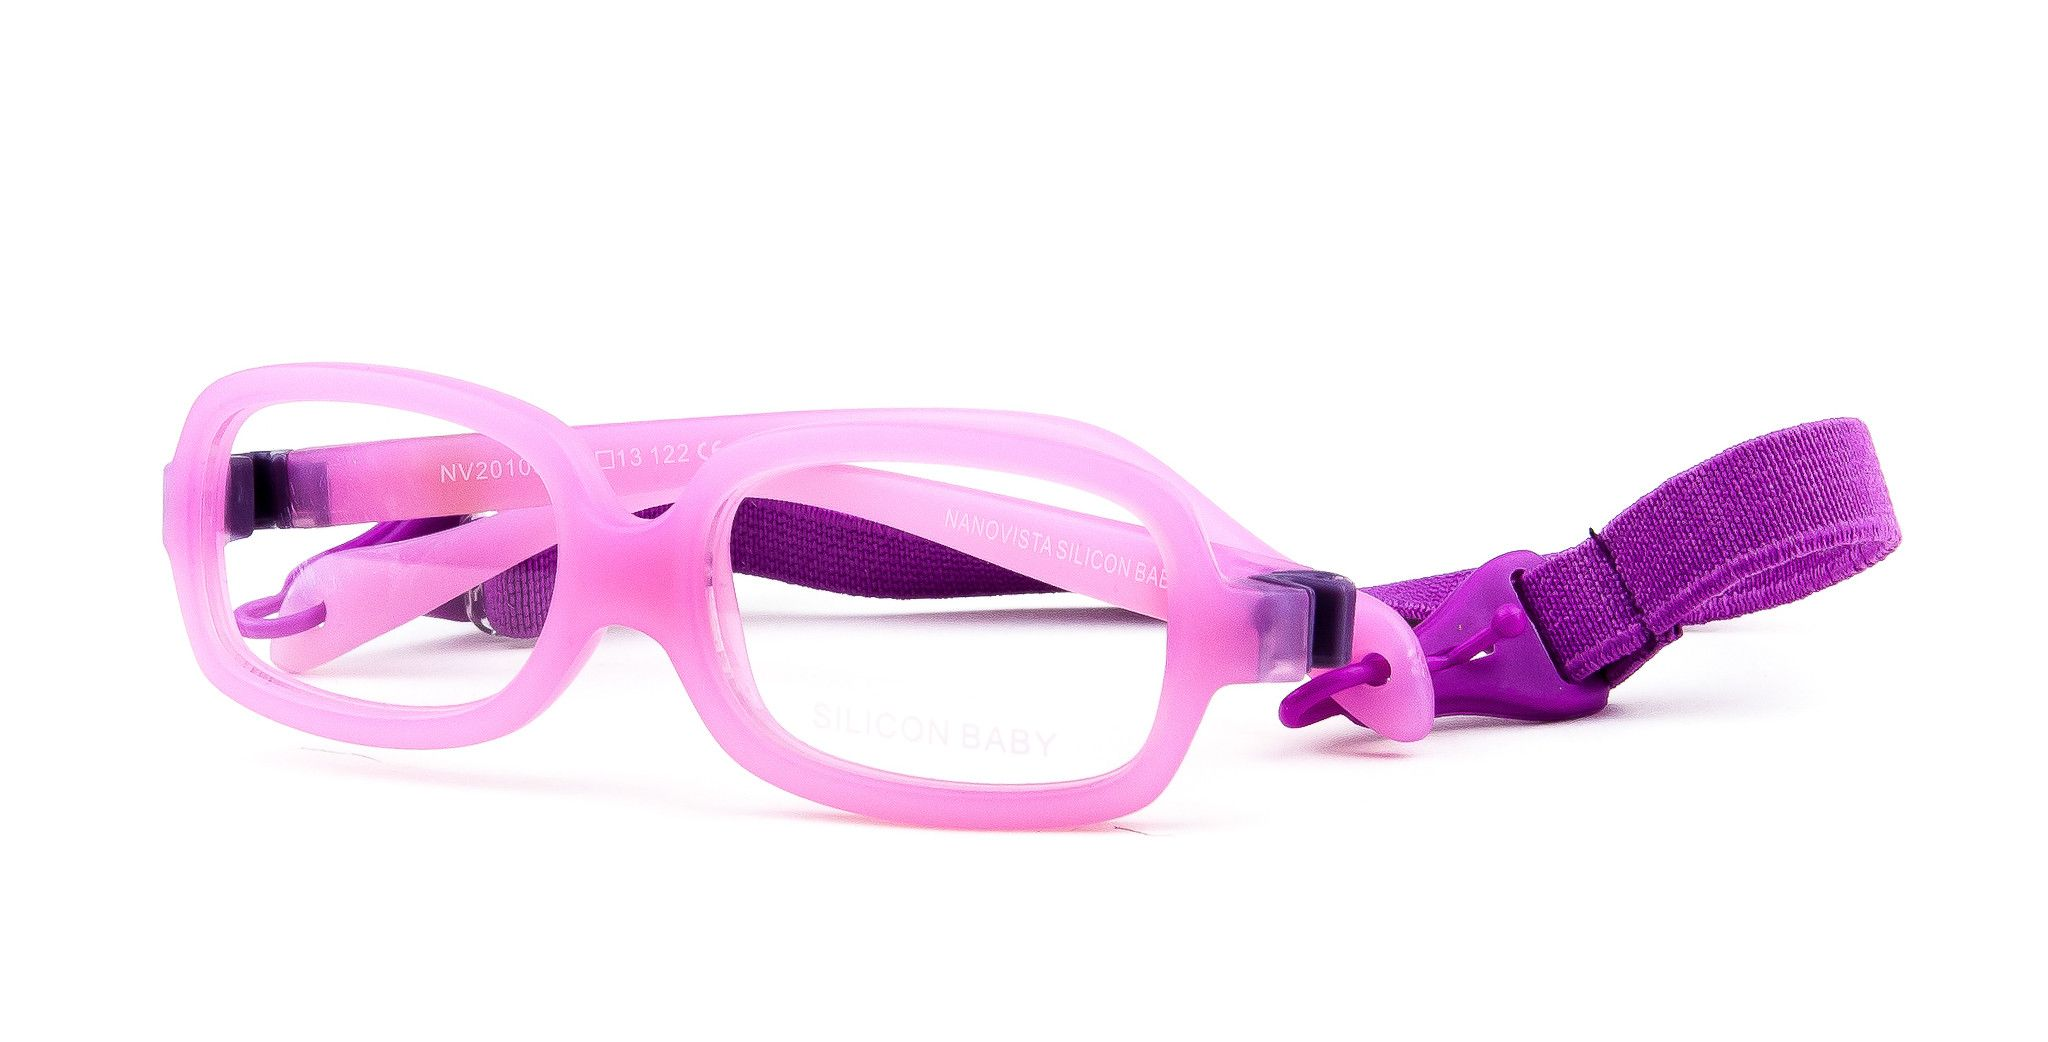 Nanovista Silicon Baby Pink Glasses in Vancouver